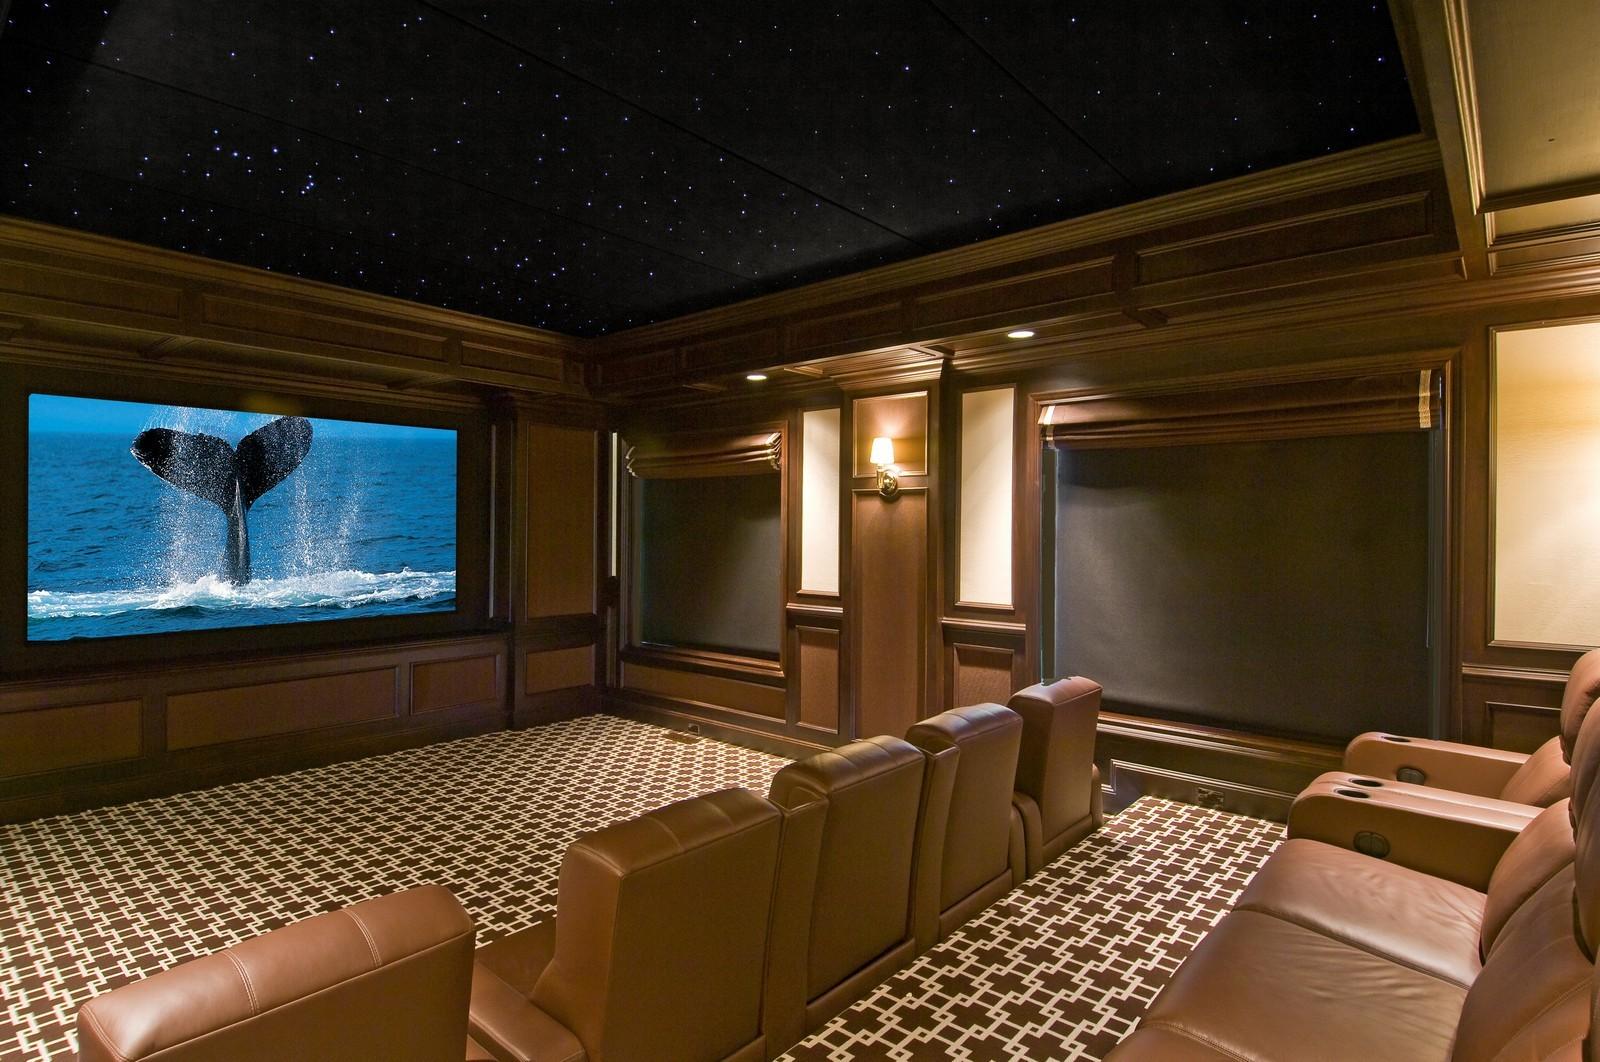 Aqui a sala de cinema...